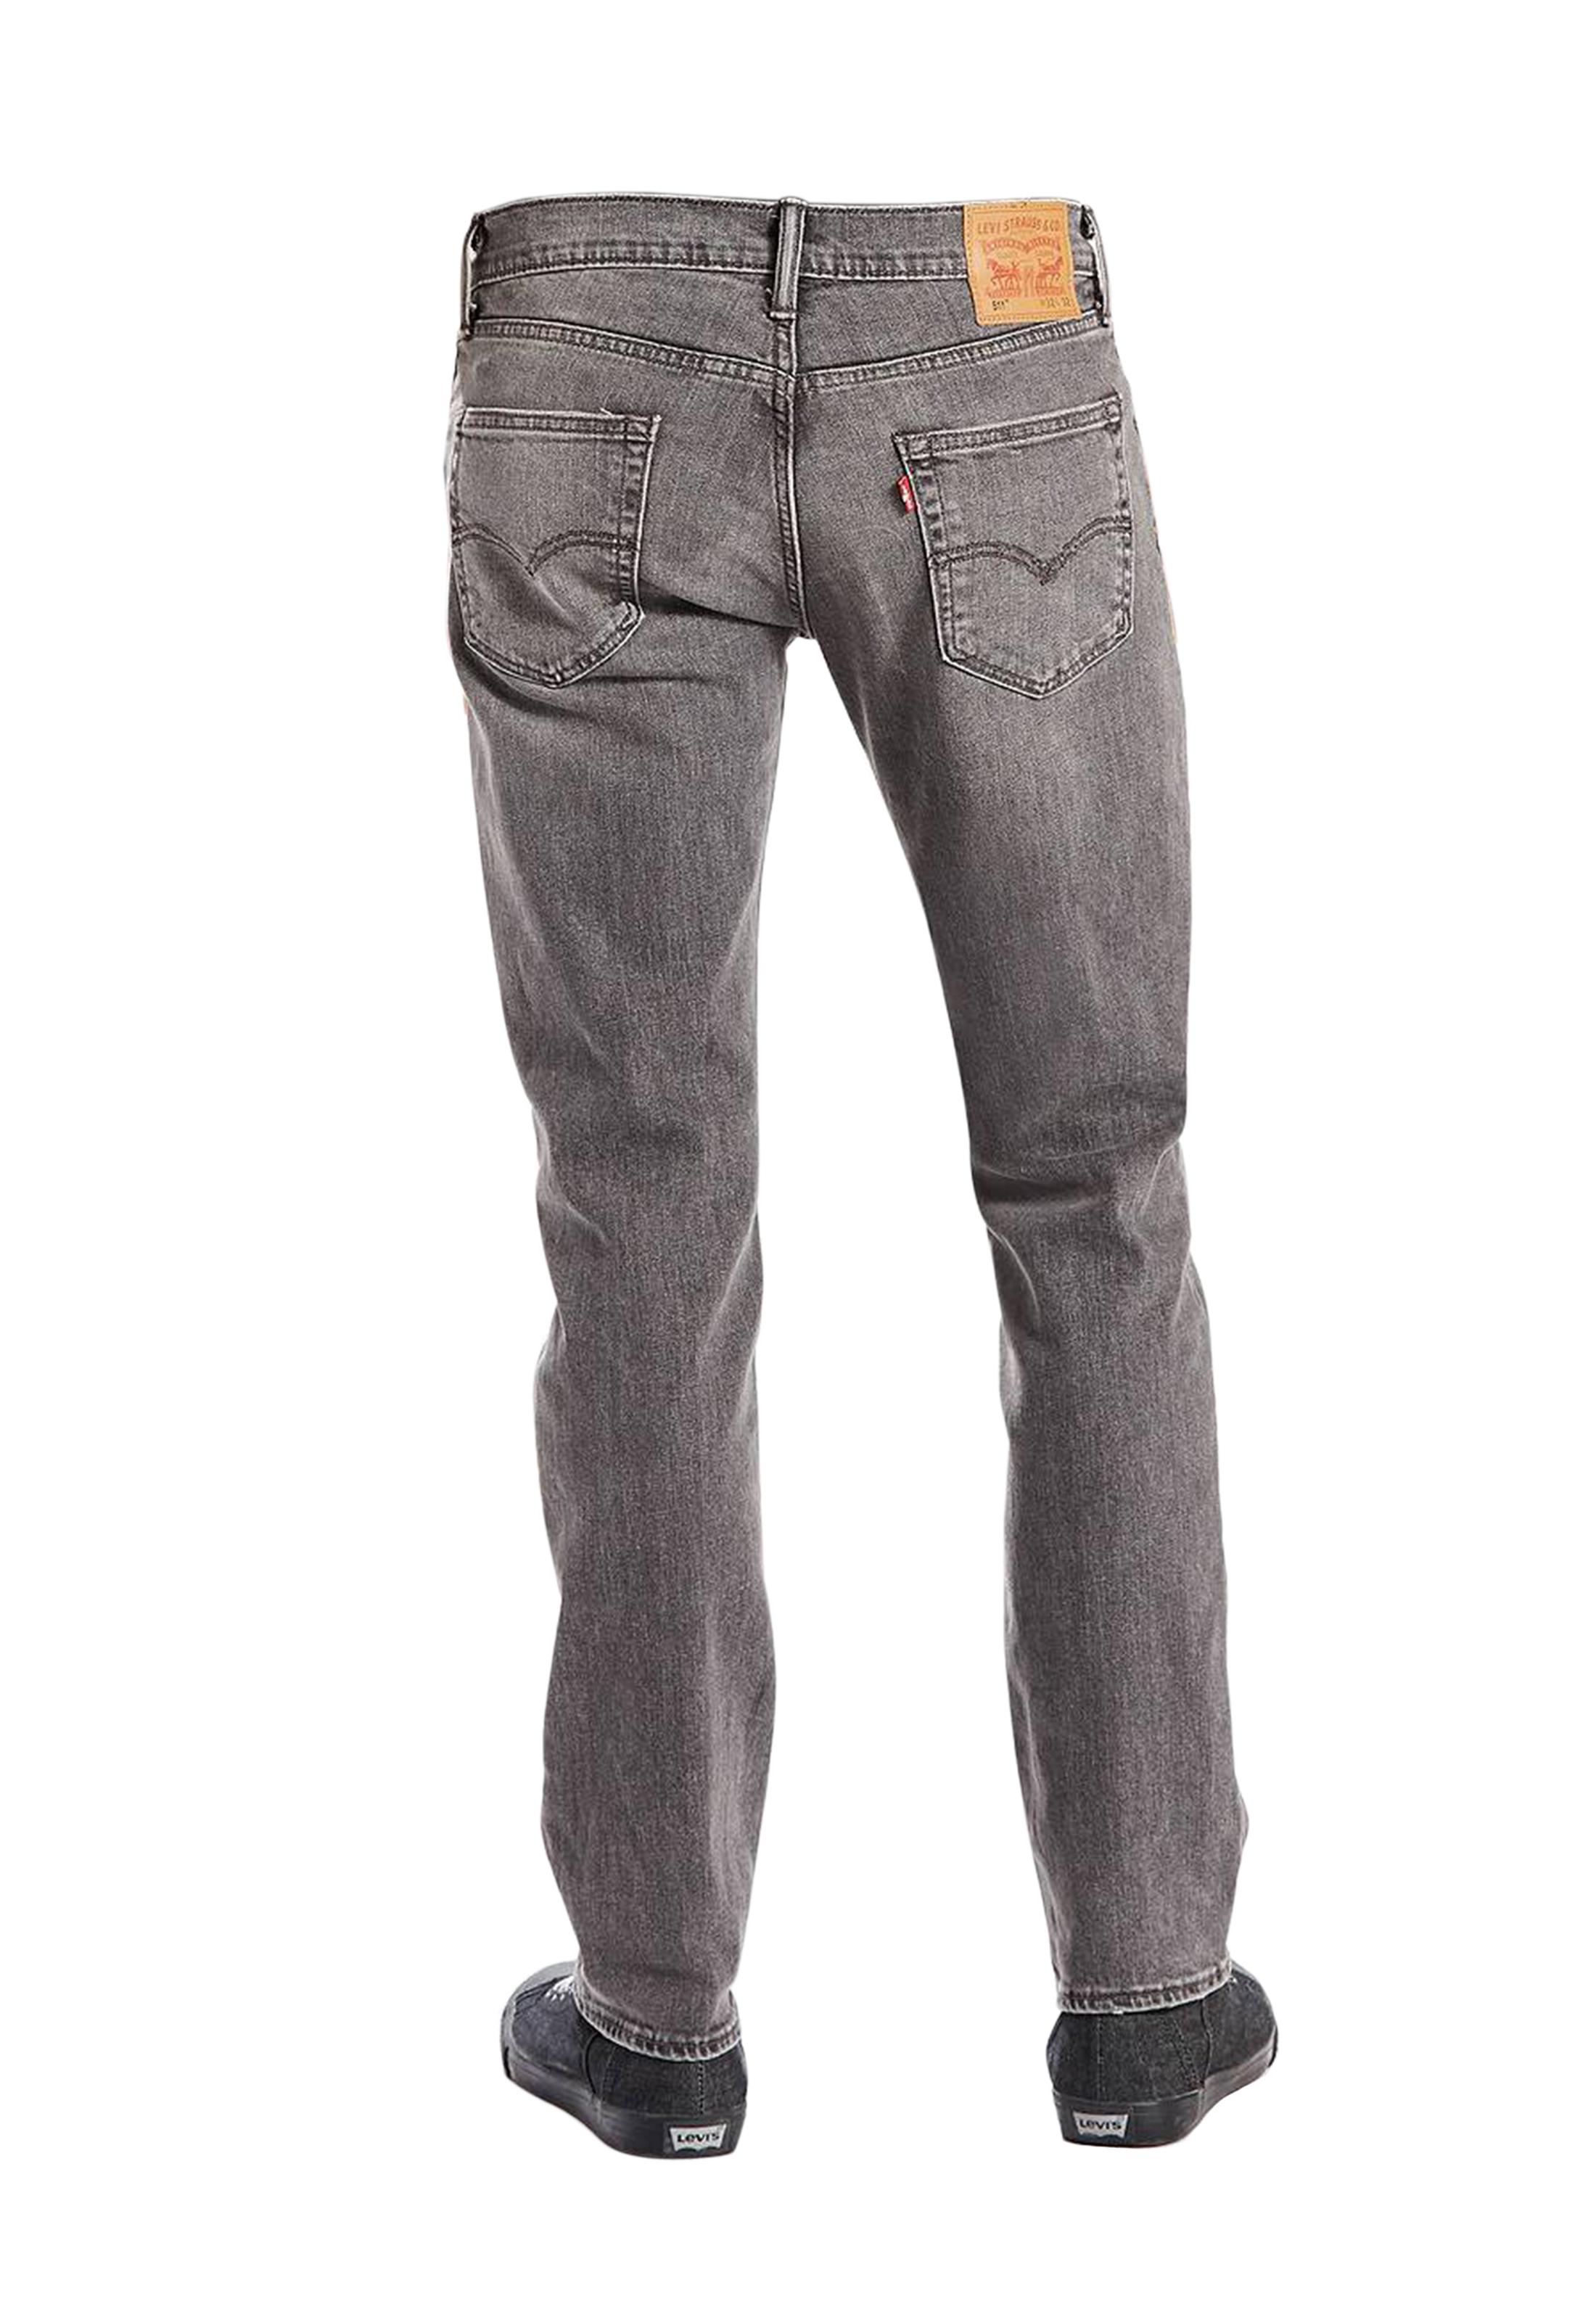 Levi's Jeans 511 Slim-Fit foto 2